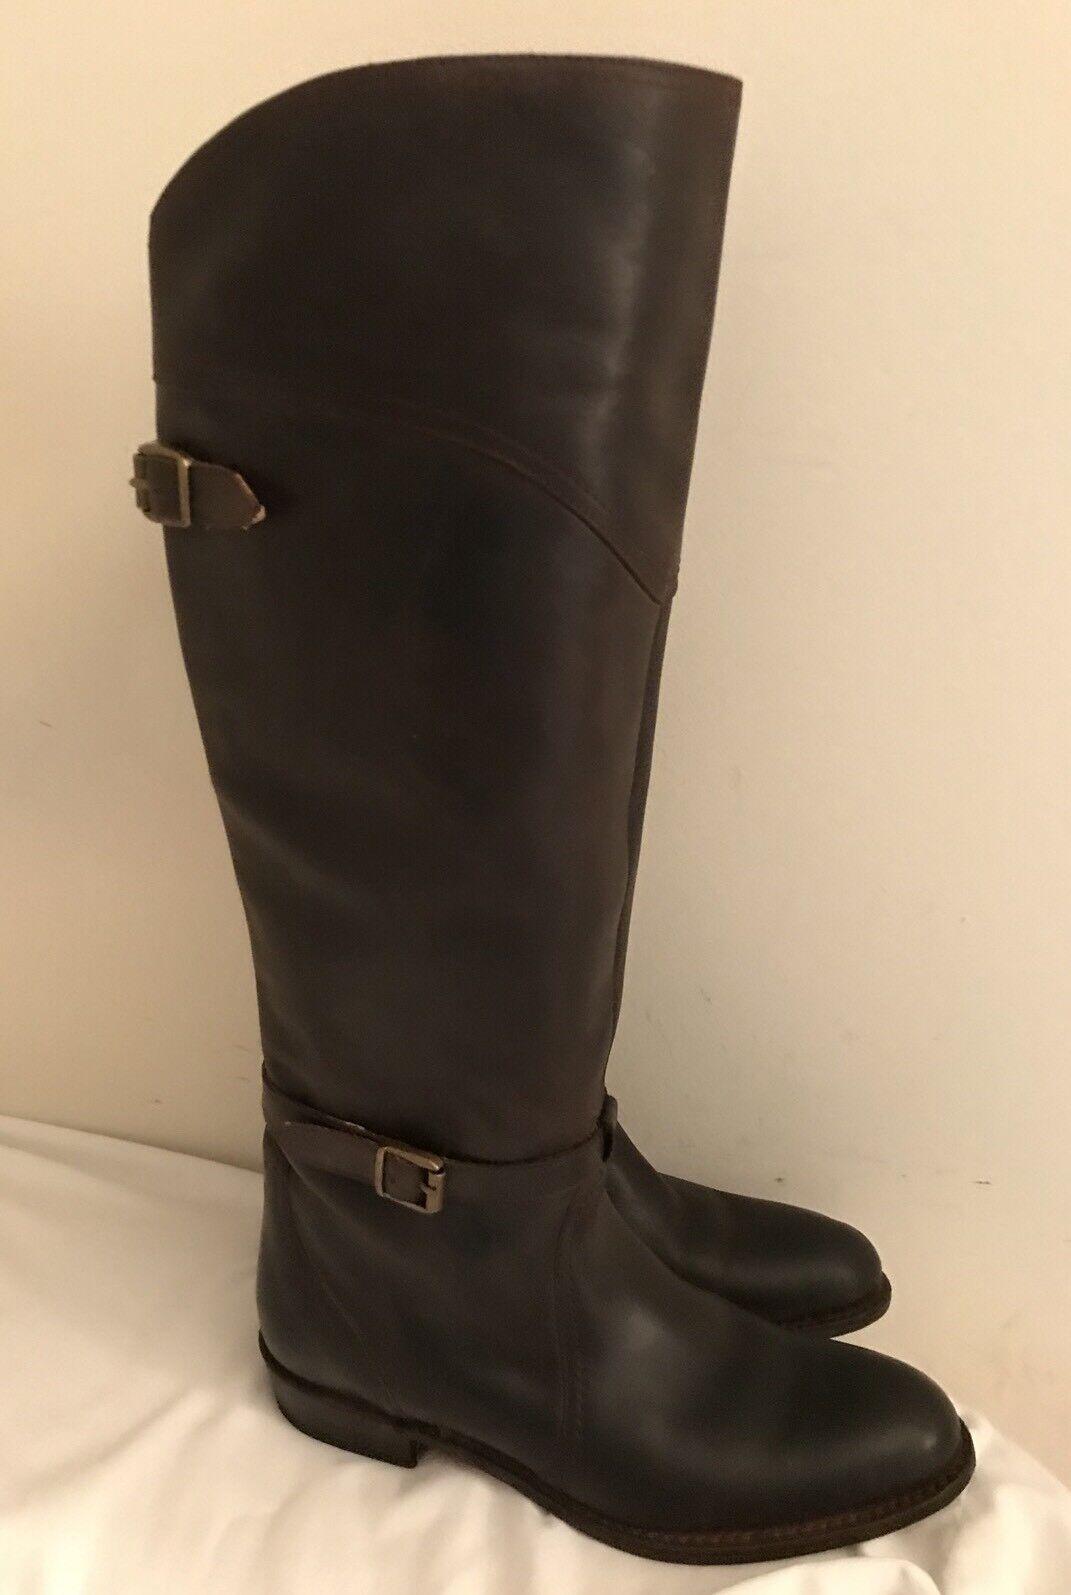 Frye  77561 Dorado Buckle Knee High Riding Boots In Dark Brown Leather  7 1 2 M